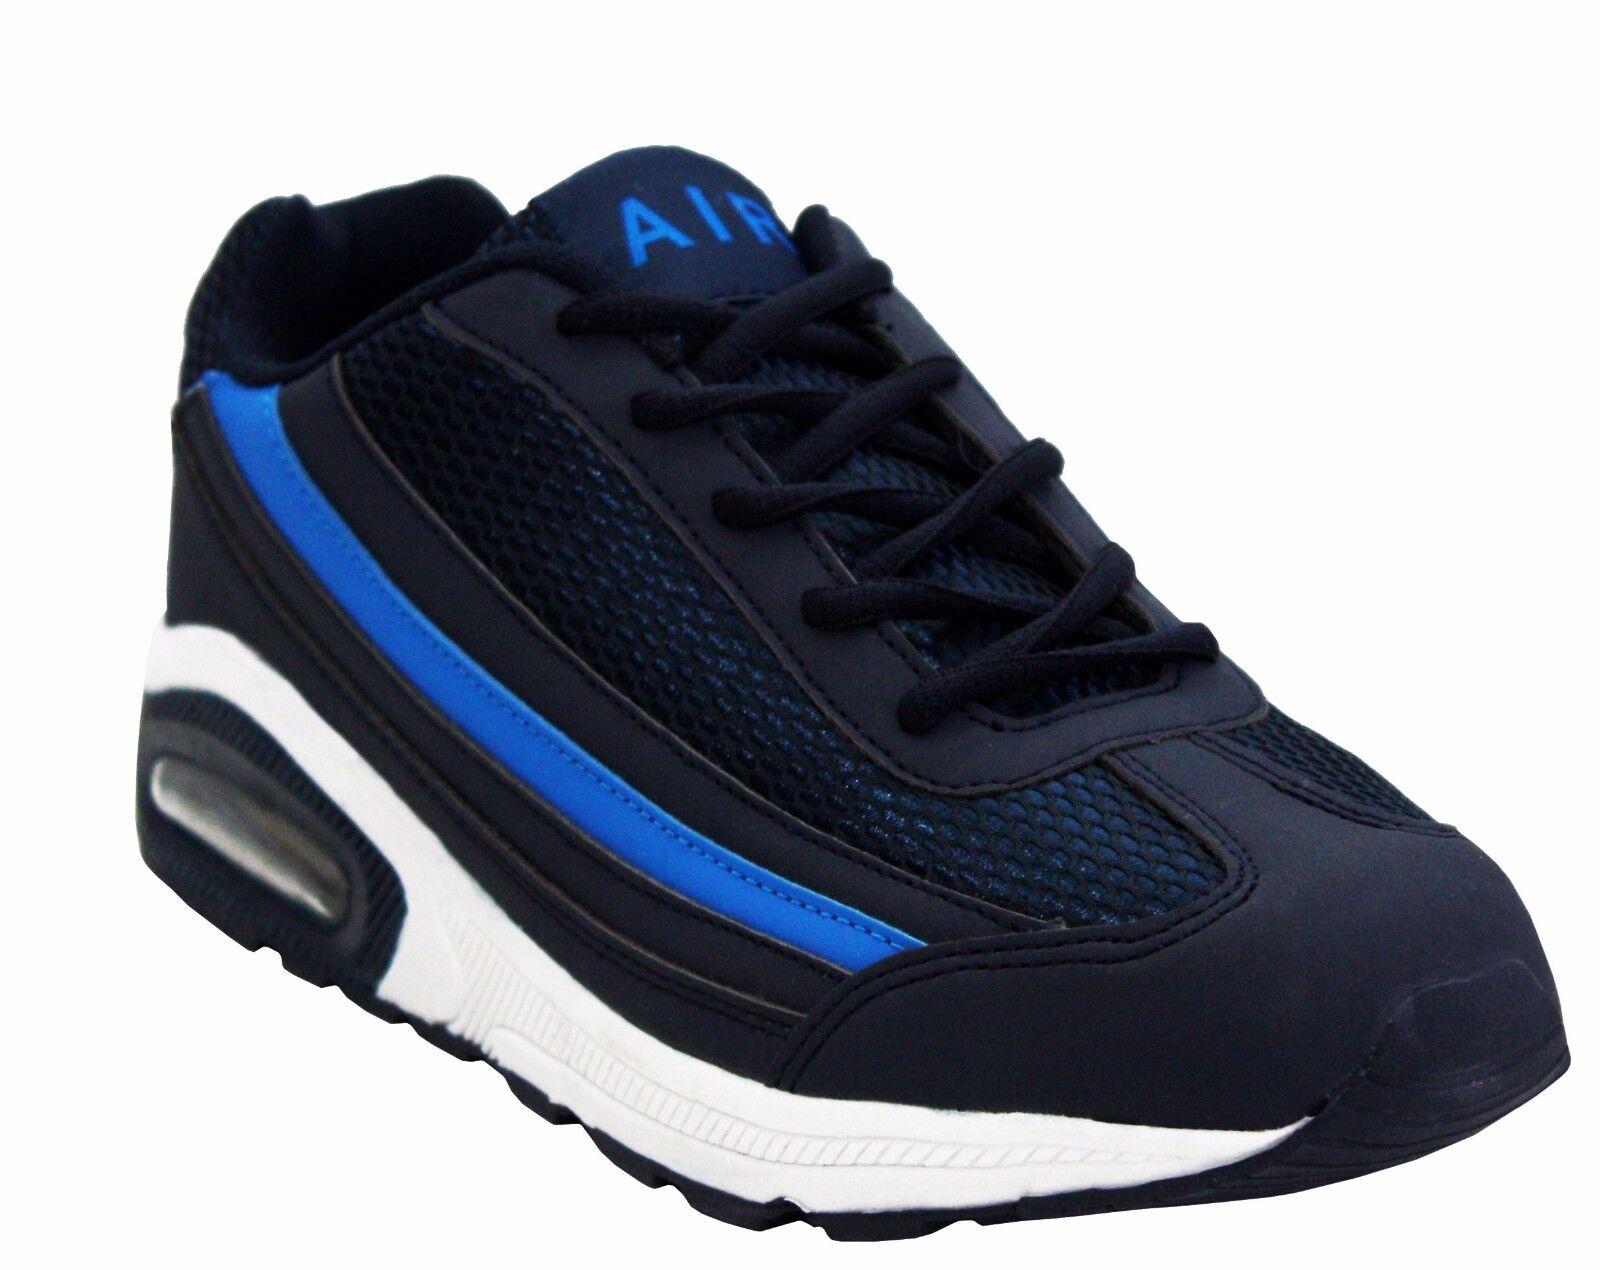 Nouveau homme running Sport jogging antichoc Gym Sport running Baskets Décontractées Chaussures UK 7-12 29074a